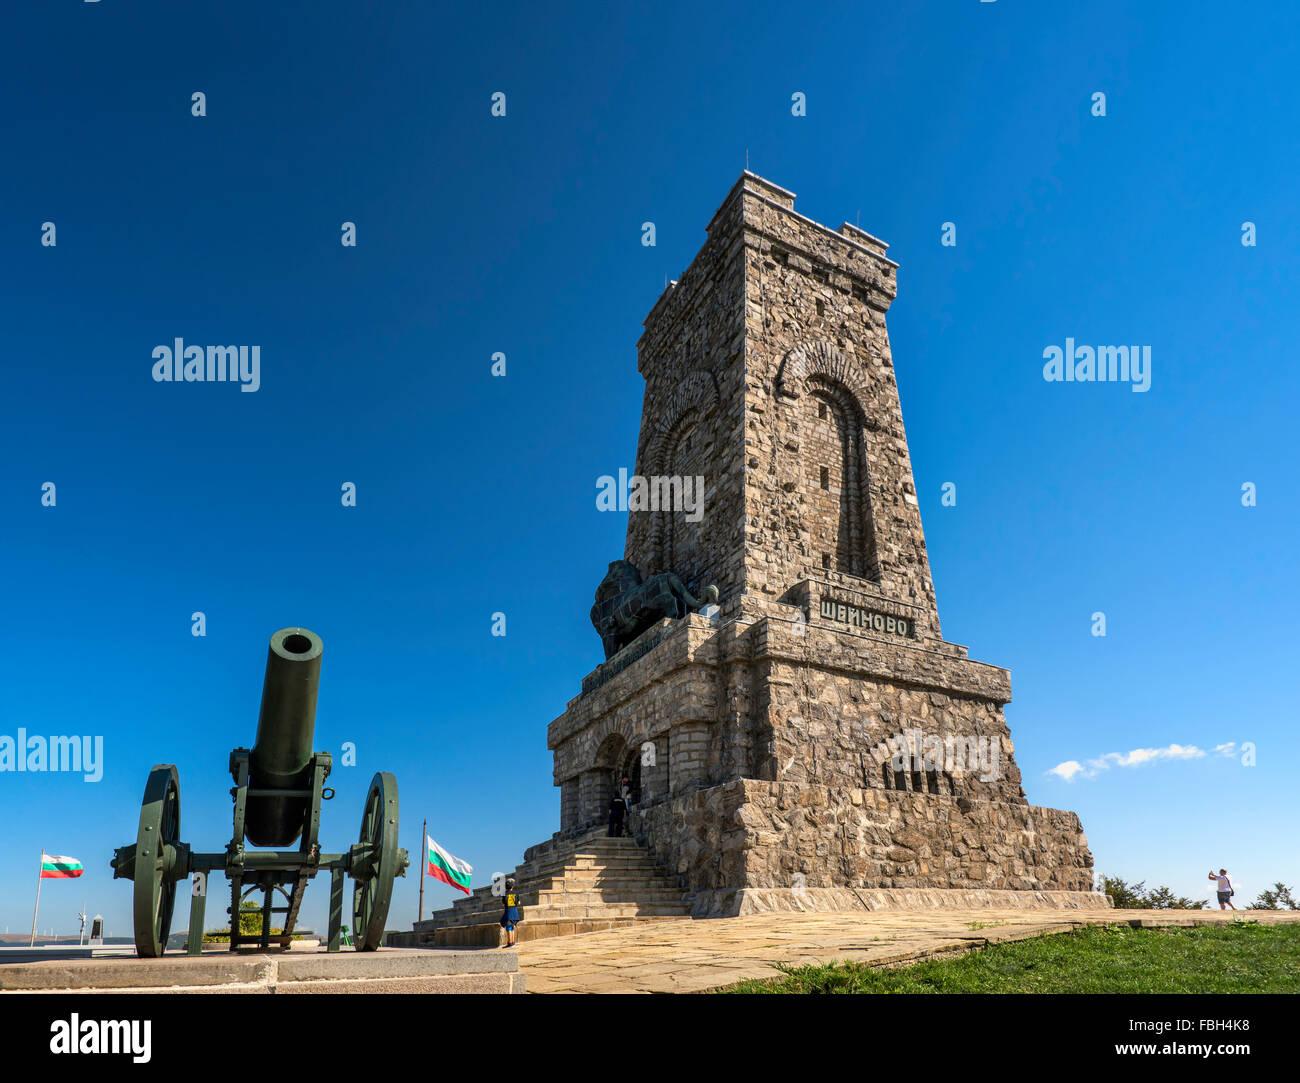 Shipka Memorial on Stoletov Peak near Shipka Pass in Balkan Mountains (Stara  Planina), near Shipka, Bulgaria - Stock Image